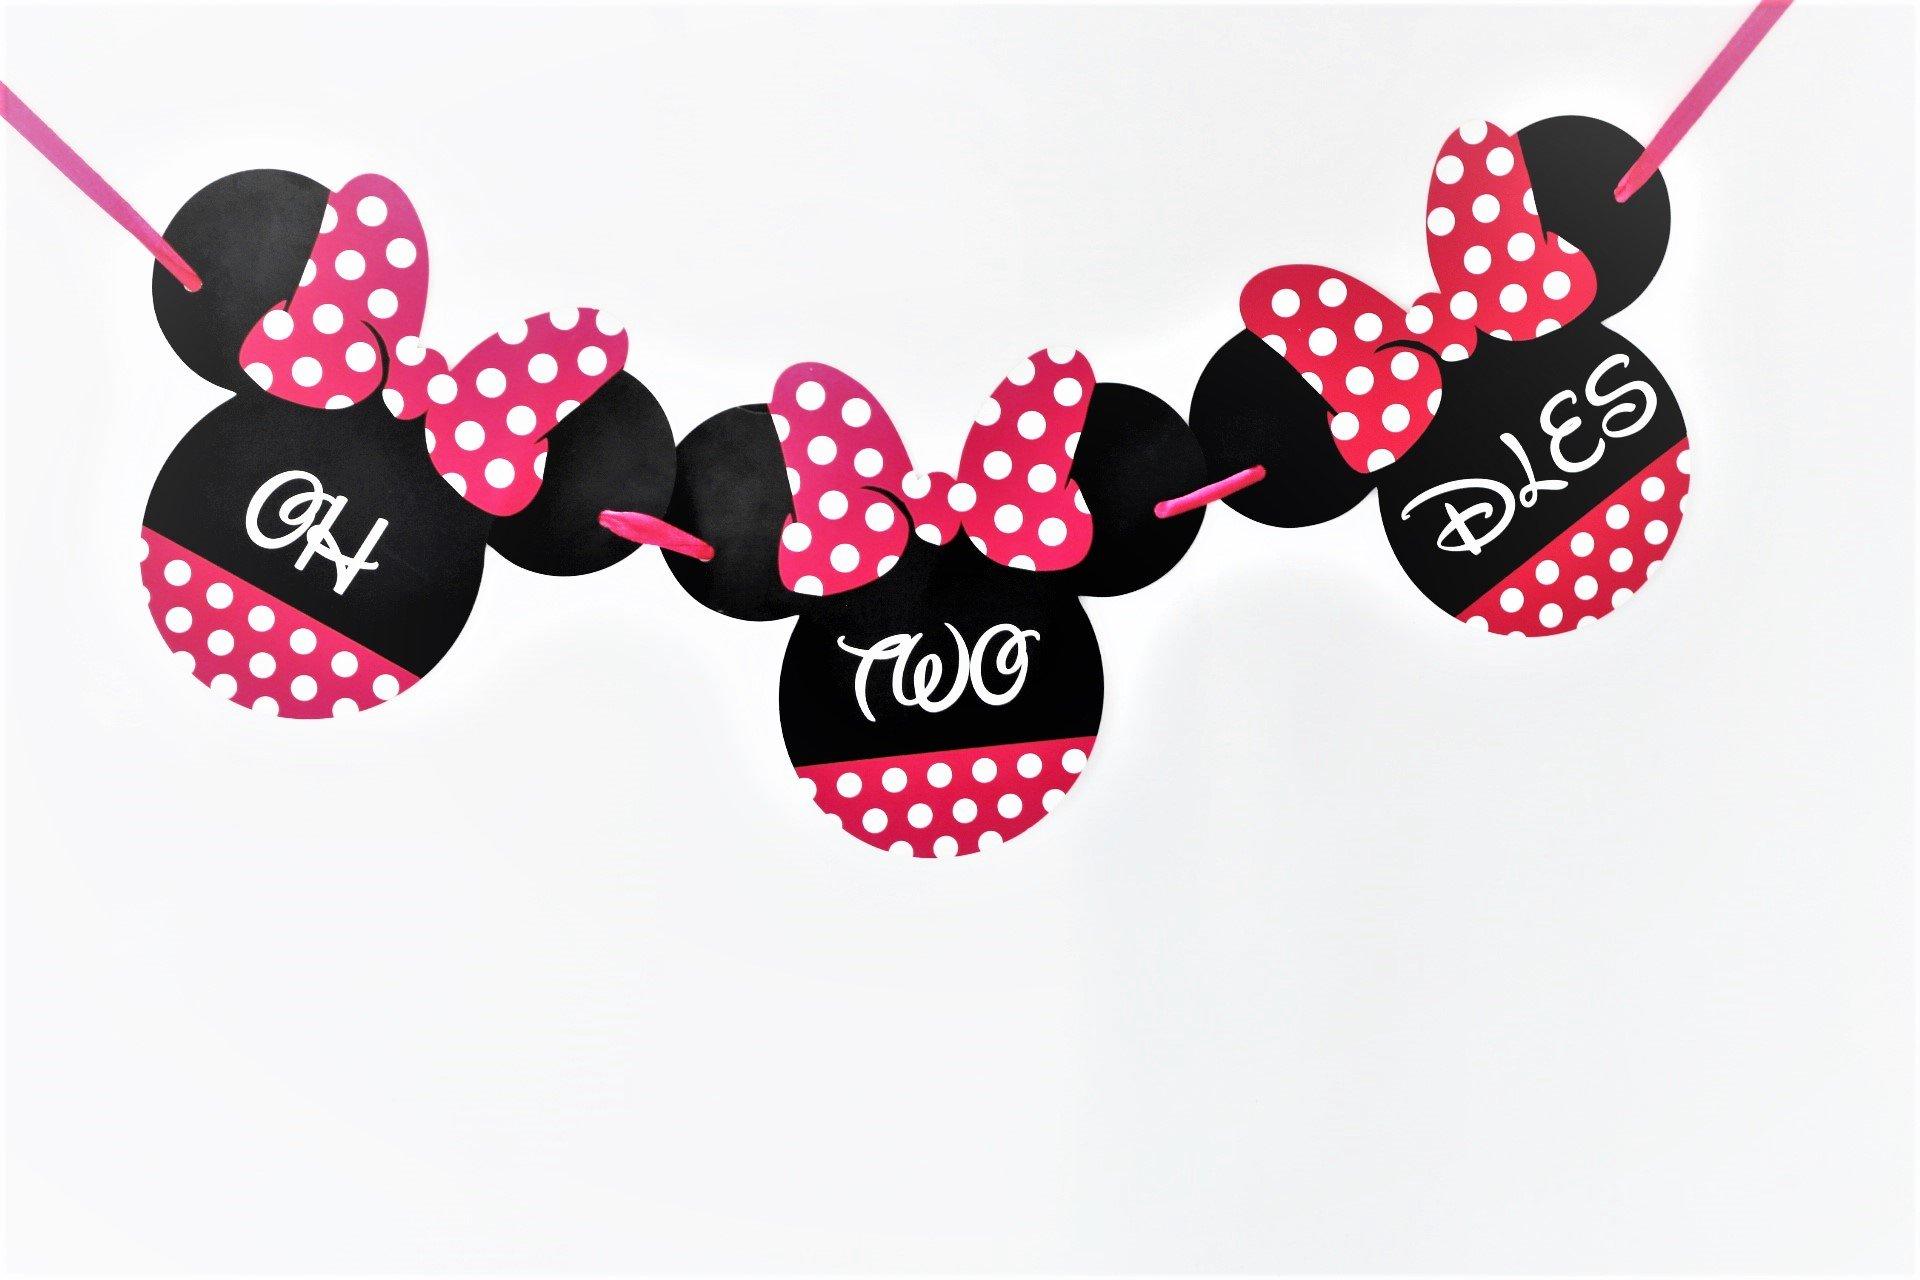 Minnie Mouse Birthday Banner - ONE Birthday Banner - OH TWO DLES! Minnie mouse party supplies - Minnie Mouse Theme Birthday Party Supplies - Minnie Mouse Party Decoration (Oh two dles banner) by Signatives